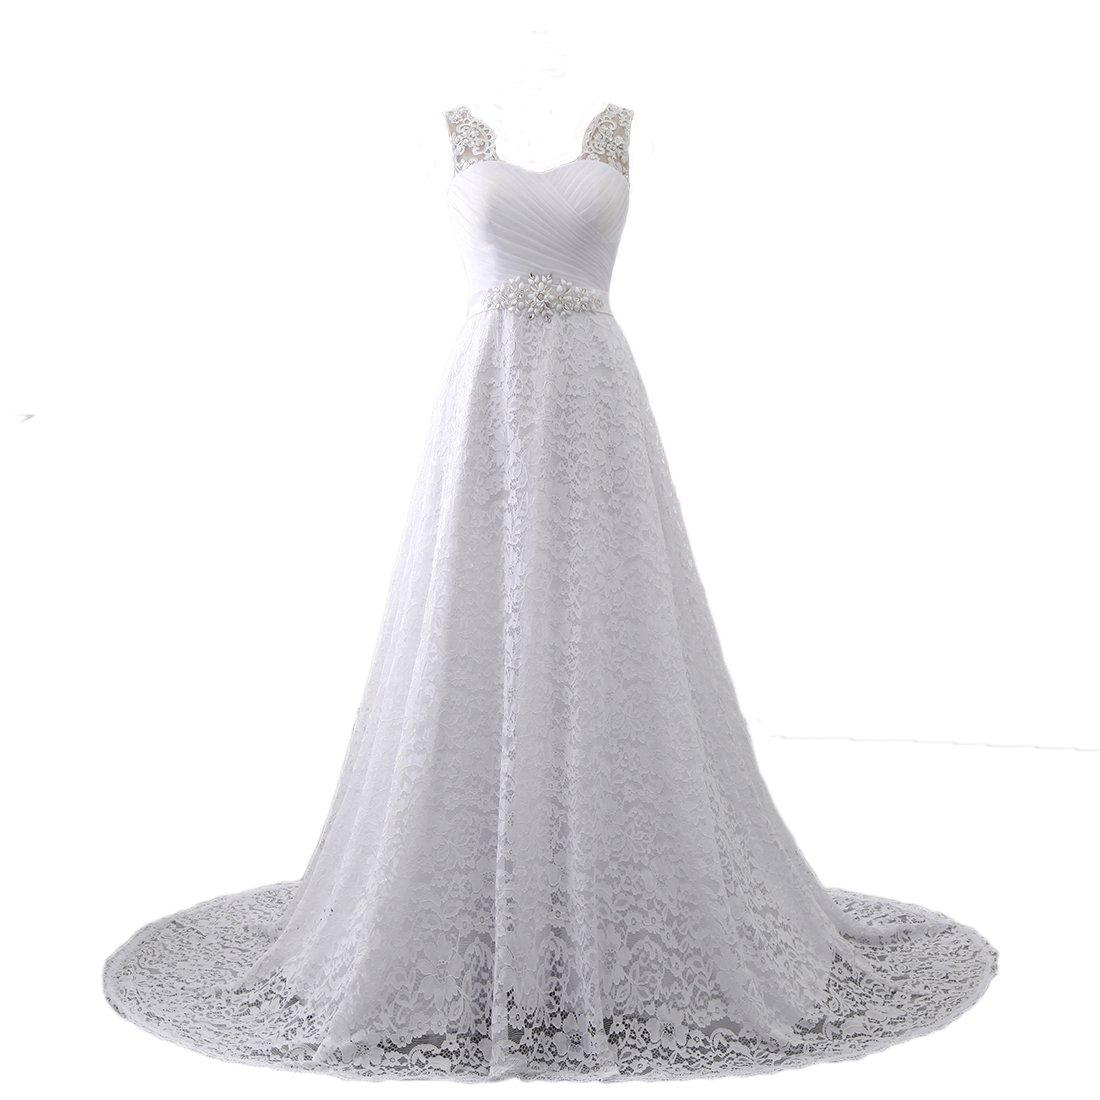 Westcorler Women's Lace A-Line Bridal Wedding Dresses (26plus, Ivory) by Westcorler